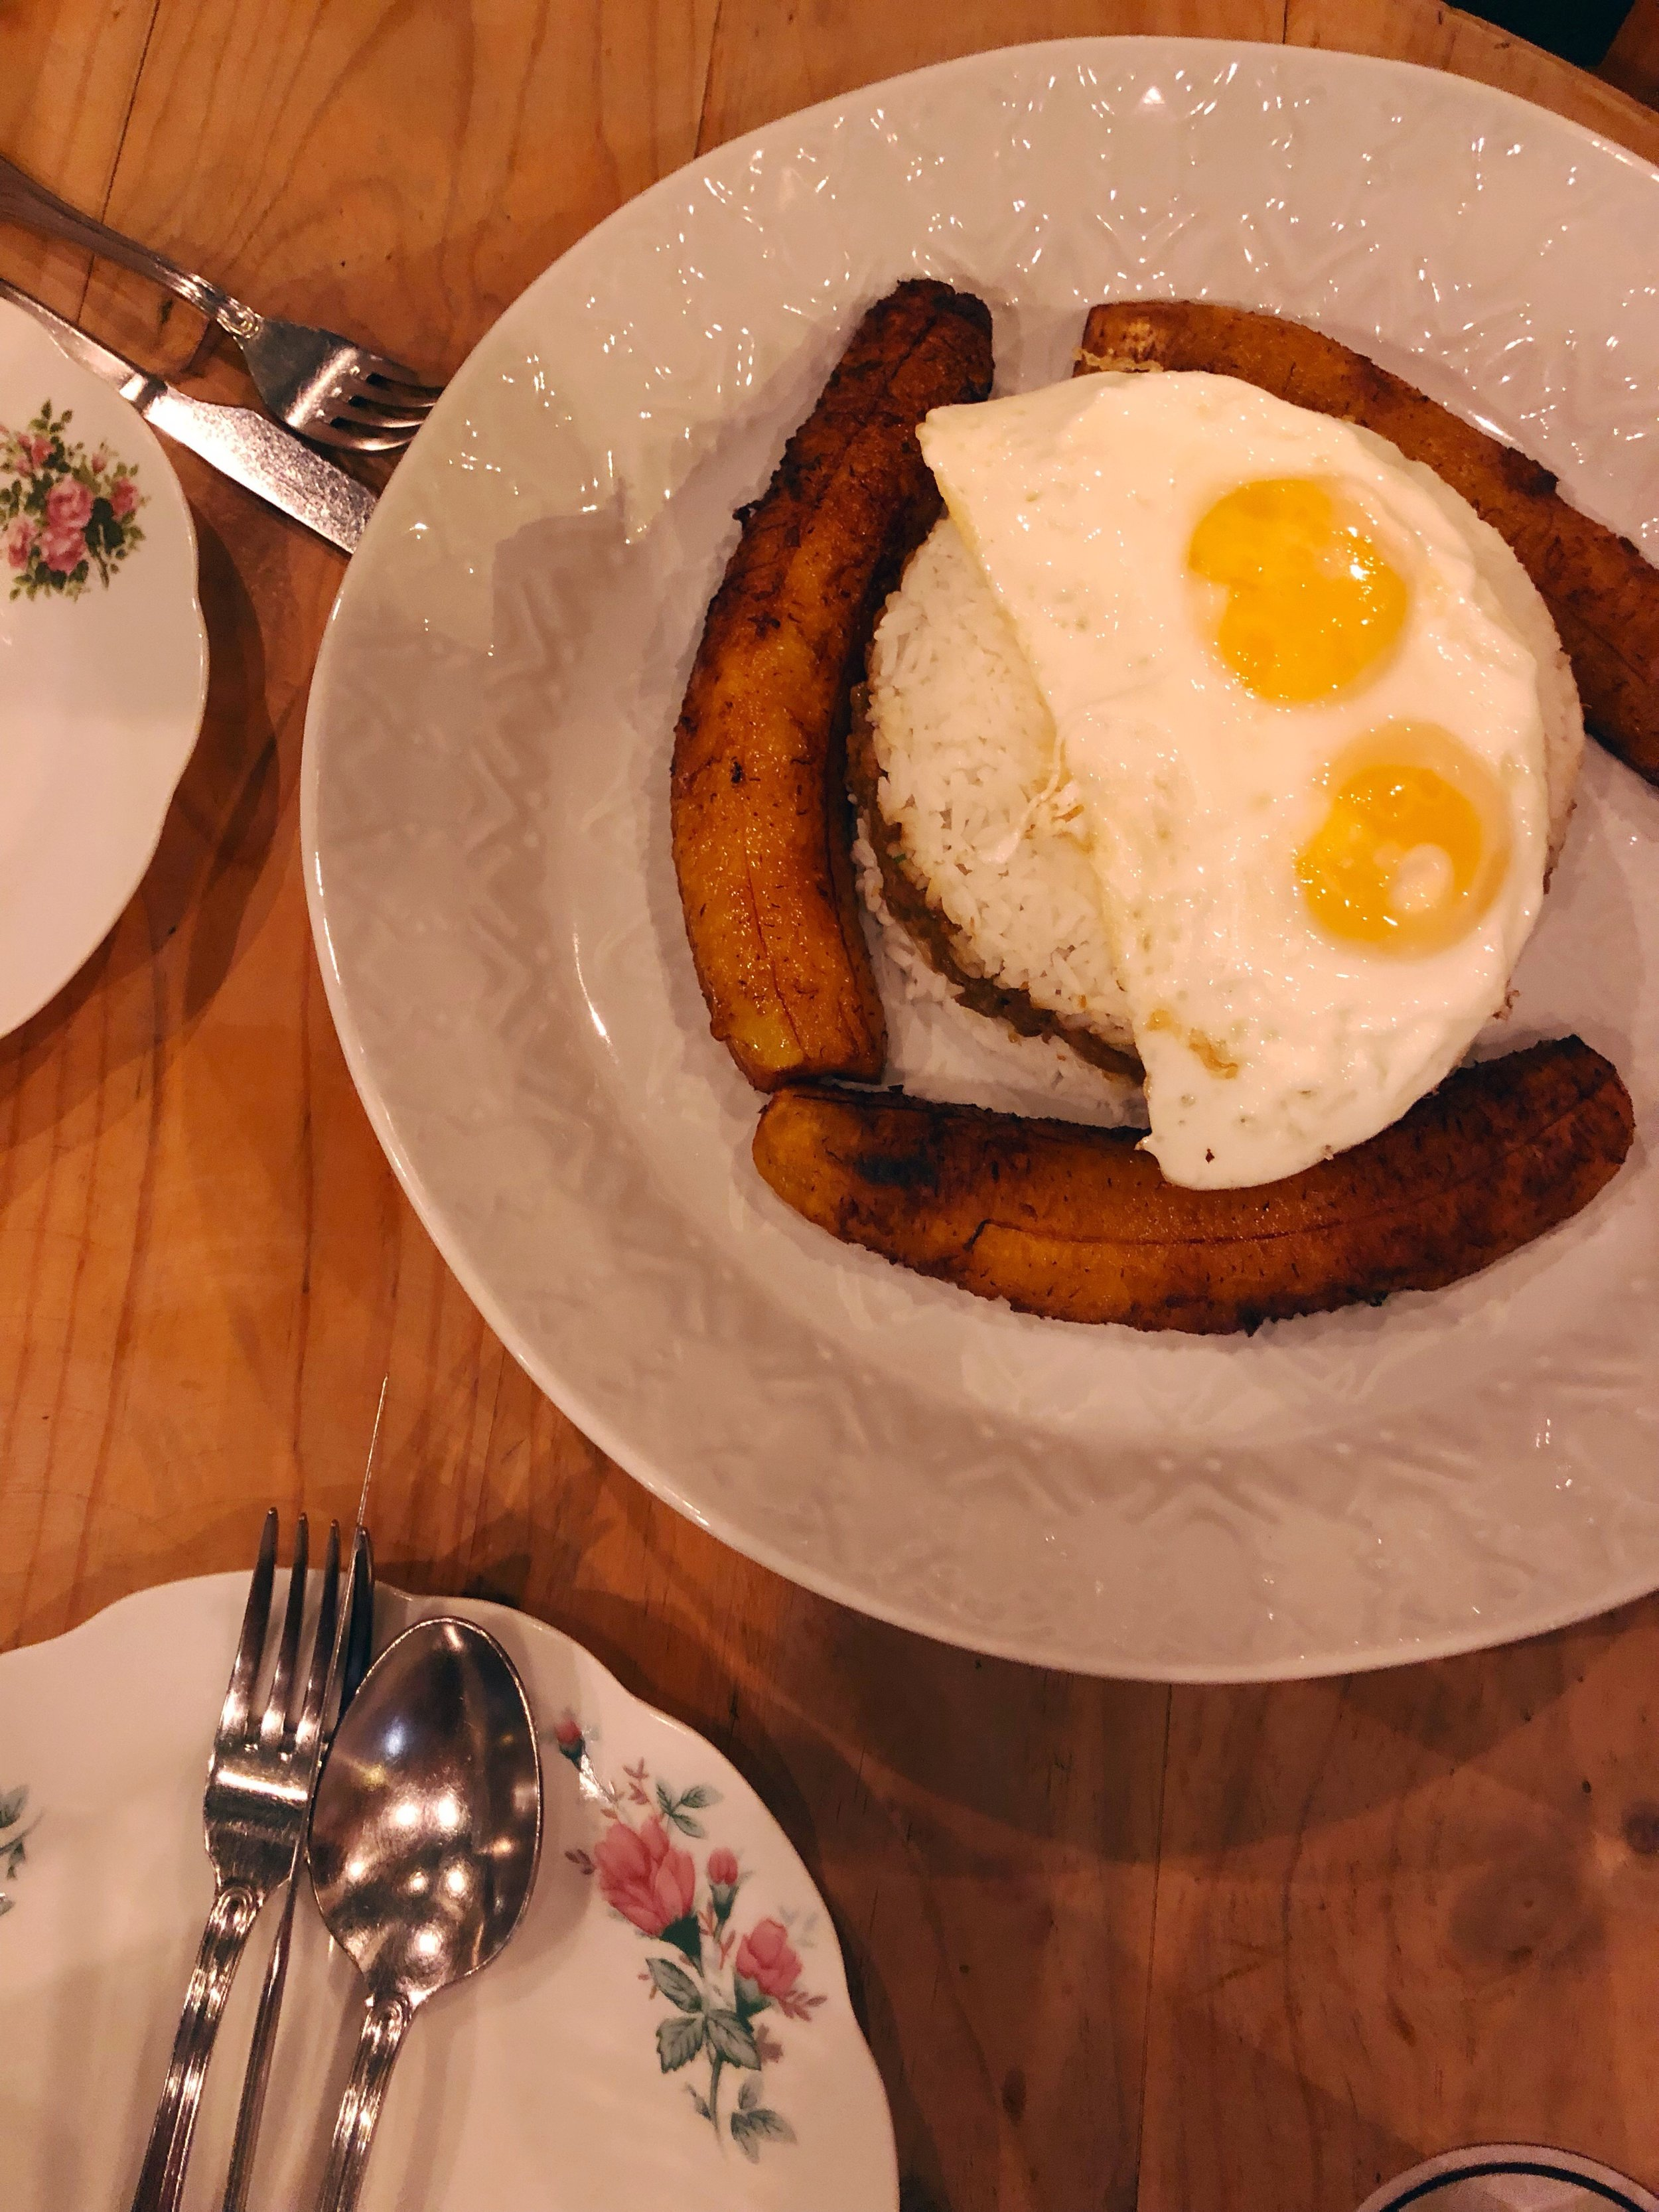 Isolina-peru-lima-barranco-food-restaurant-travel-tips-arroz